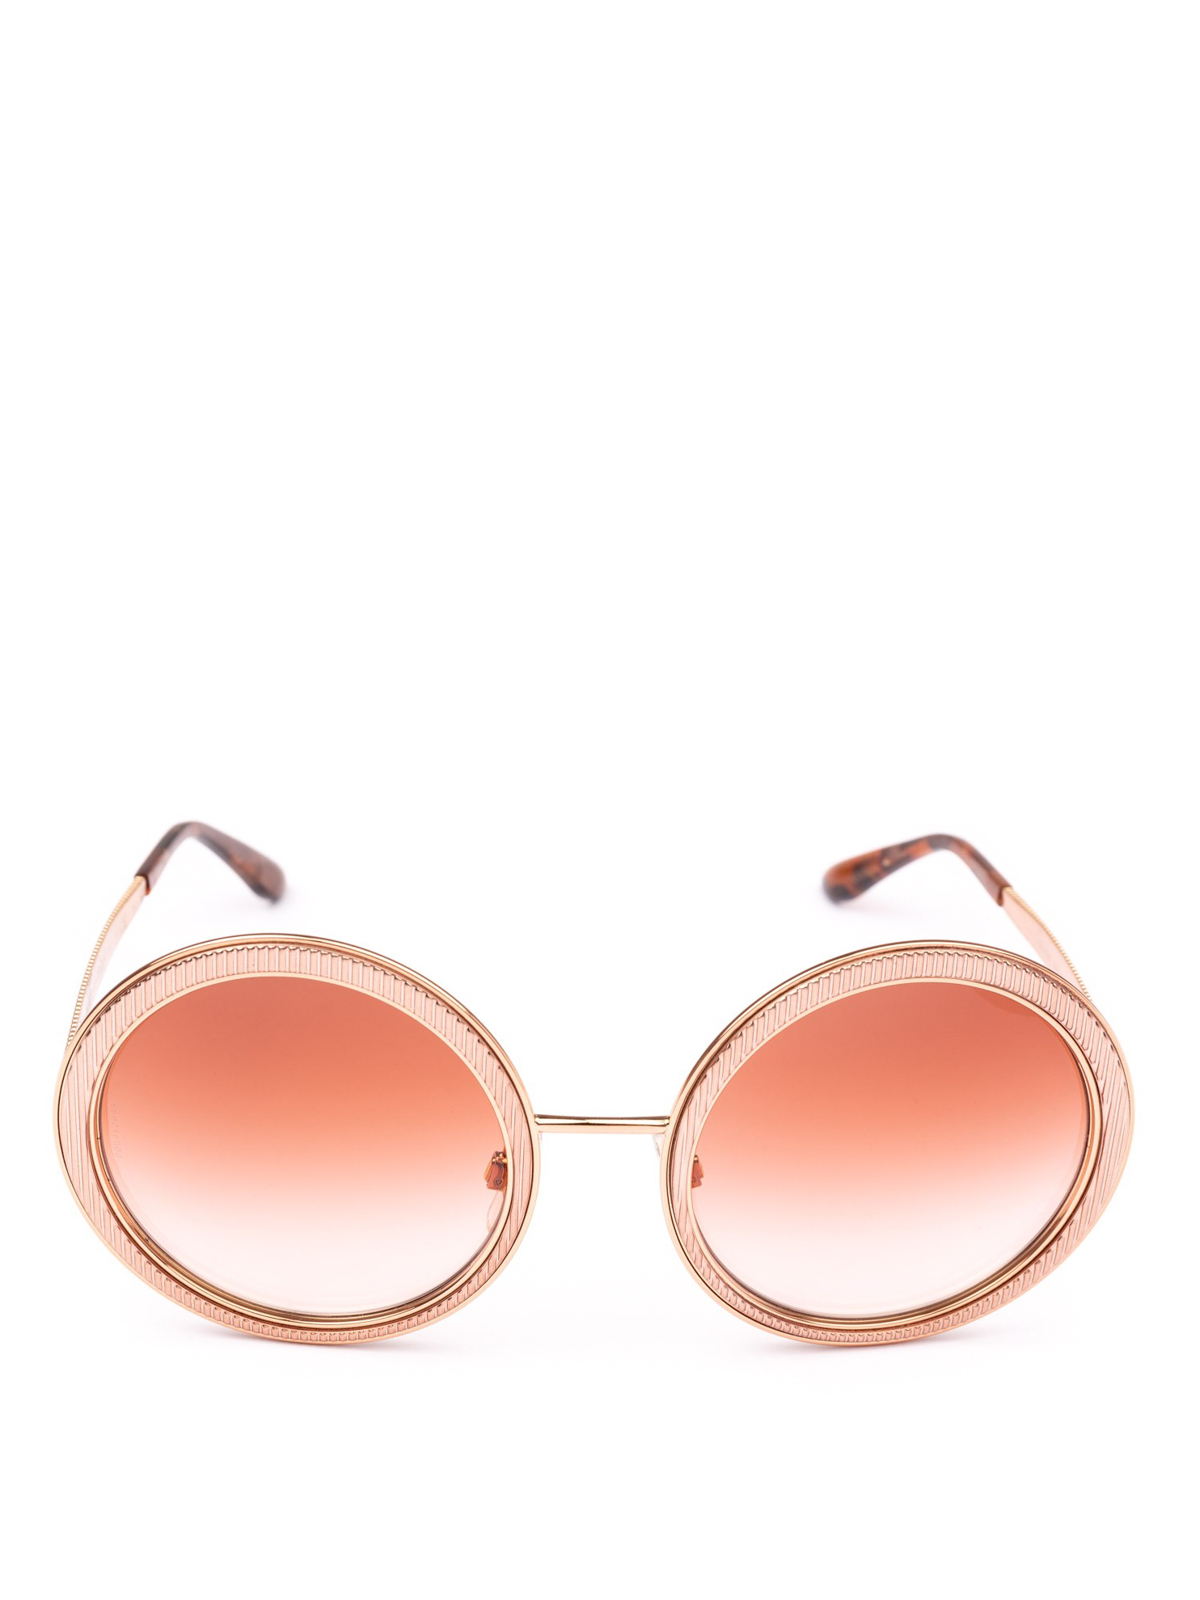 b64f79109dcc DOLCE & GABBANA: sunglasses online - Engraved rose gold metal round  sunglasses